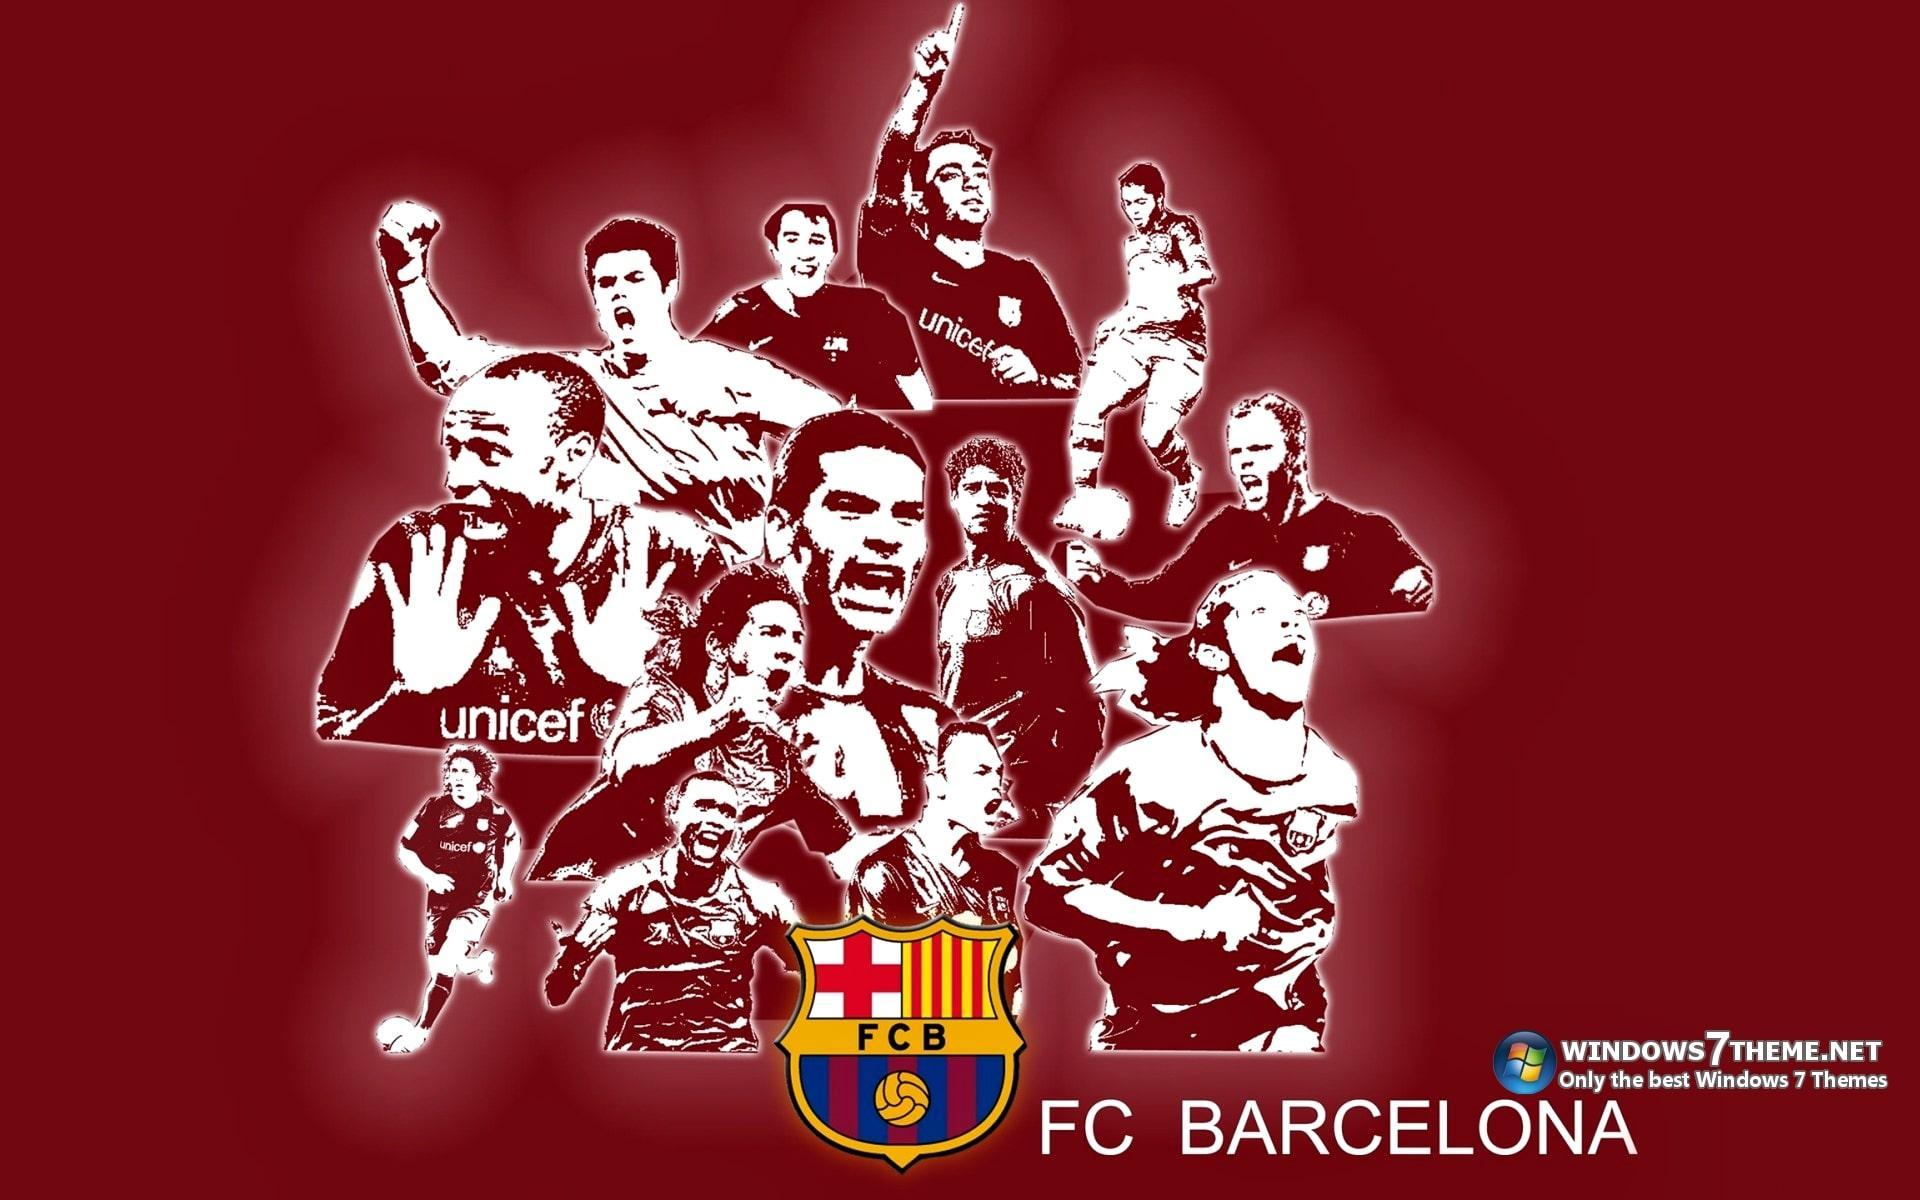 FC Barcelona Theme